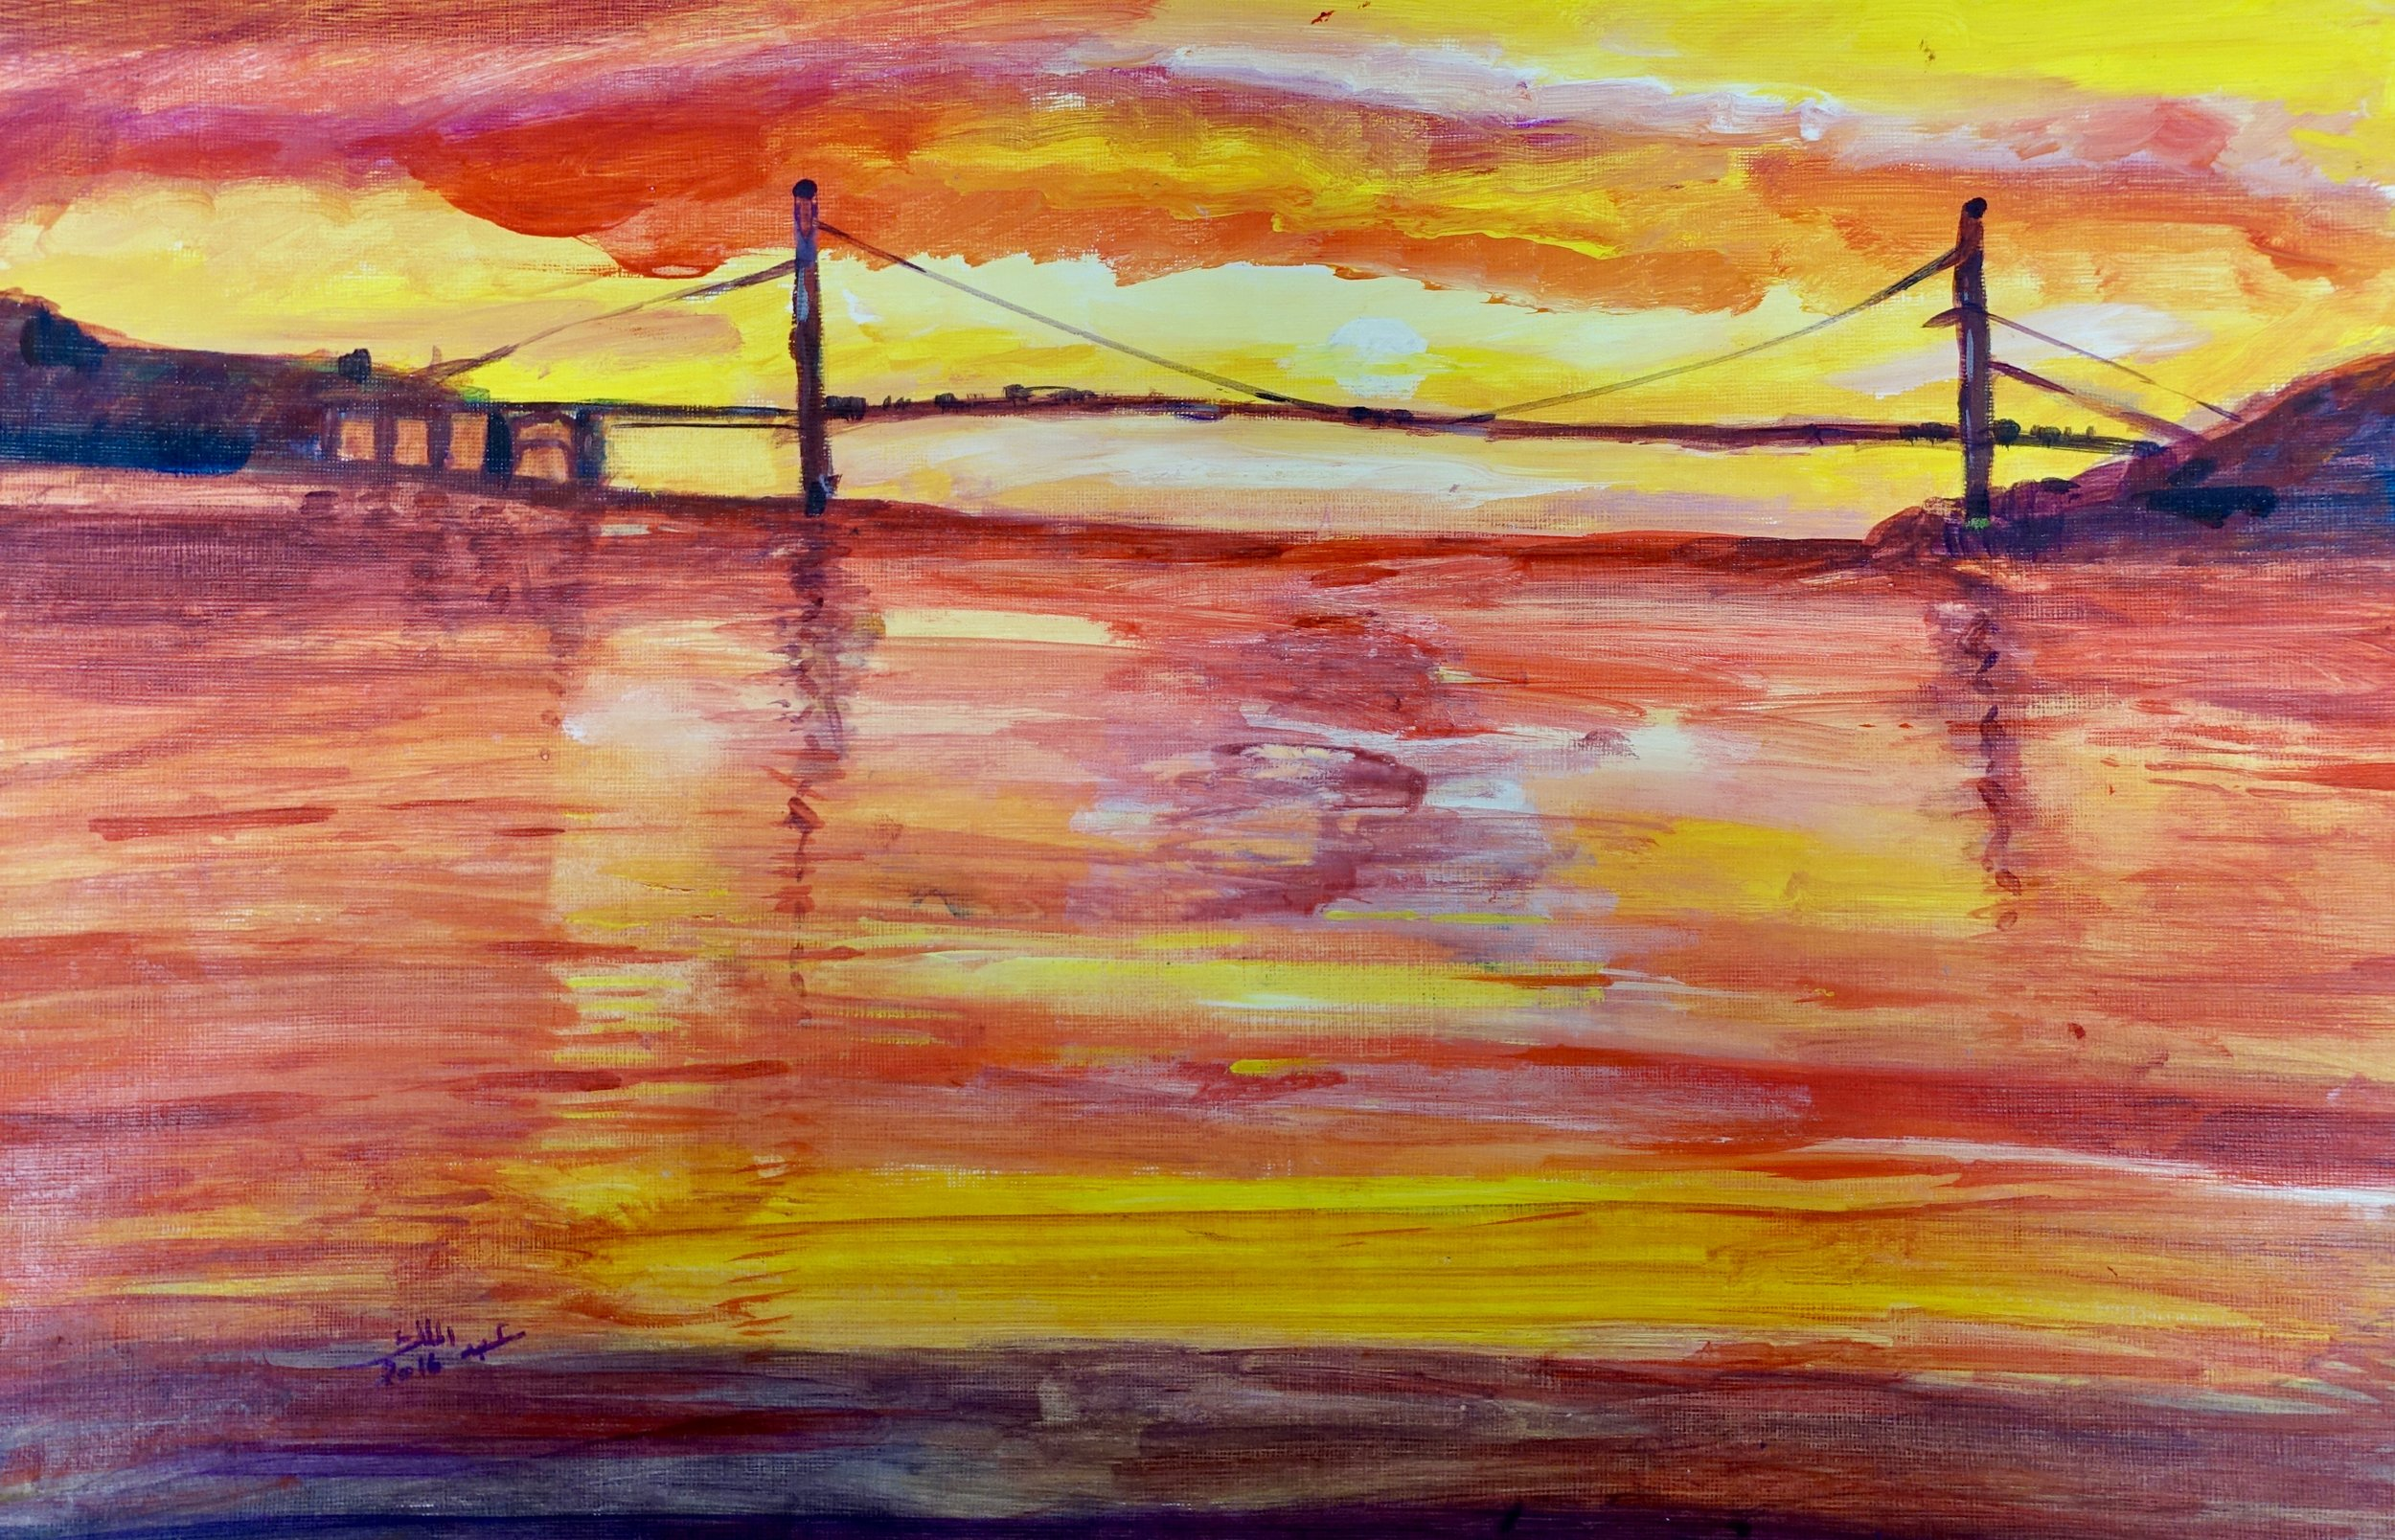 Abdualmalik Abud, Sunset with Bridge, 2016.